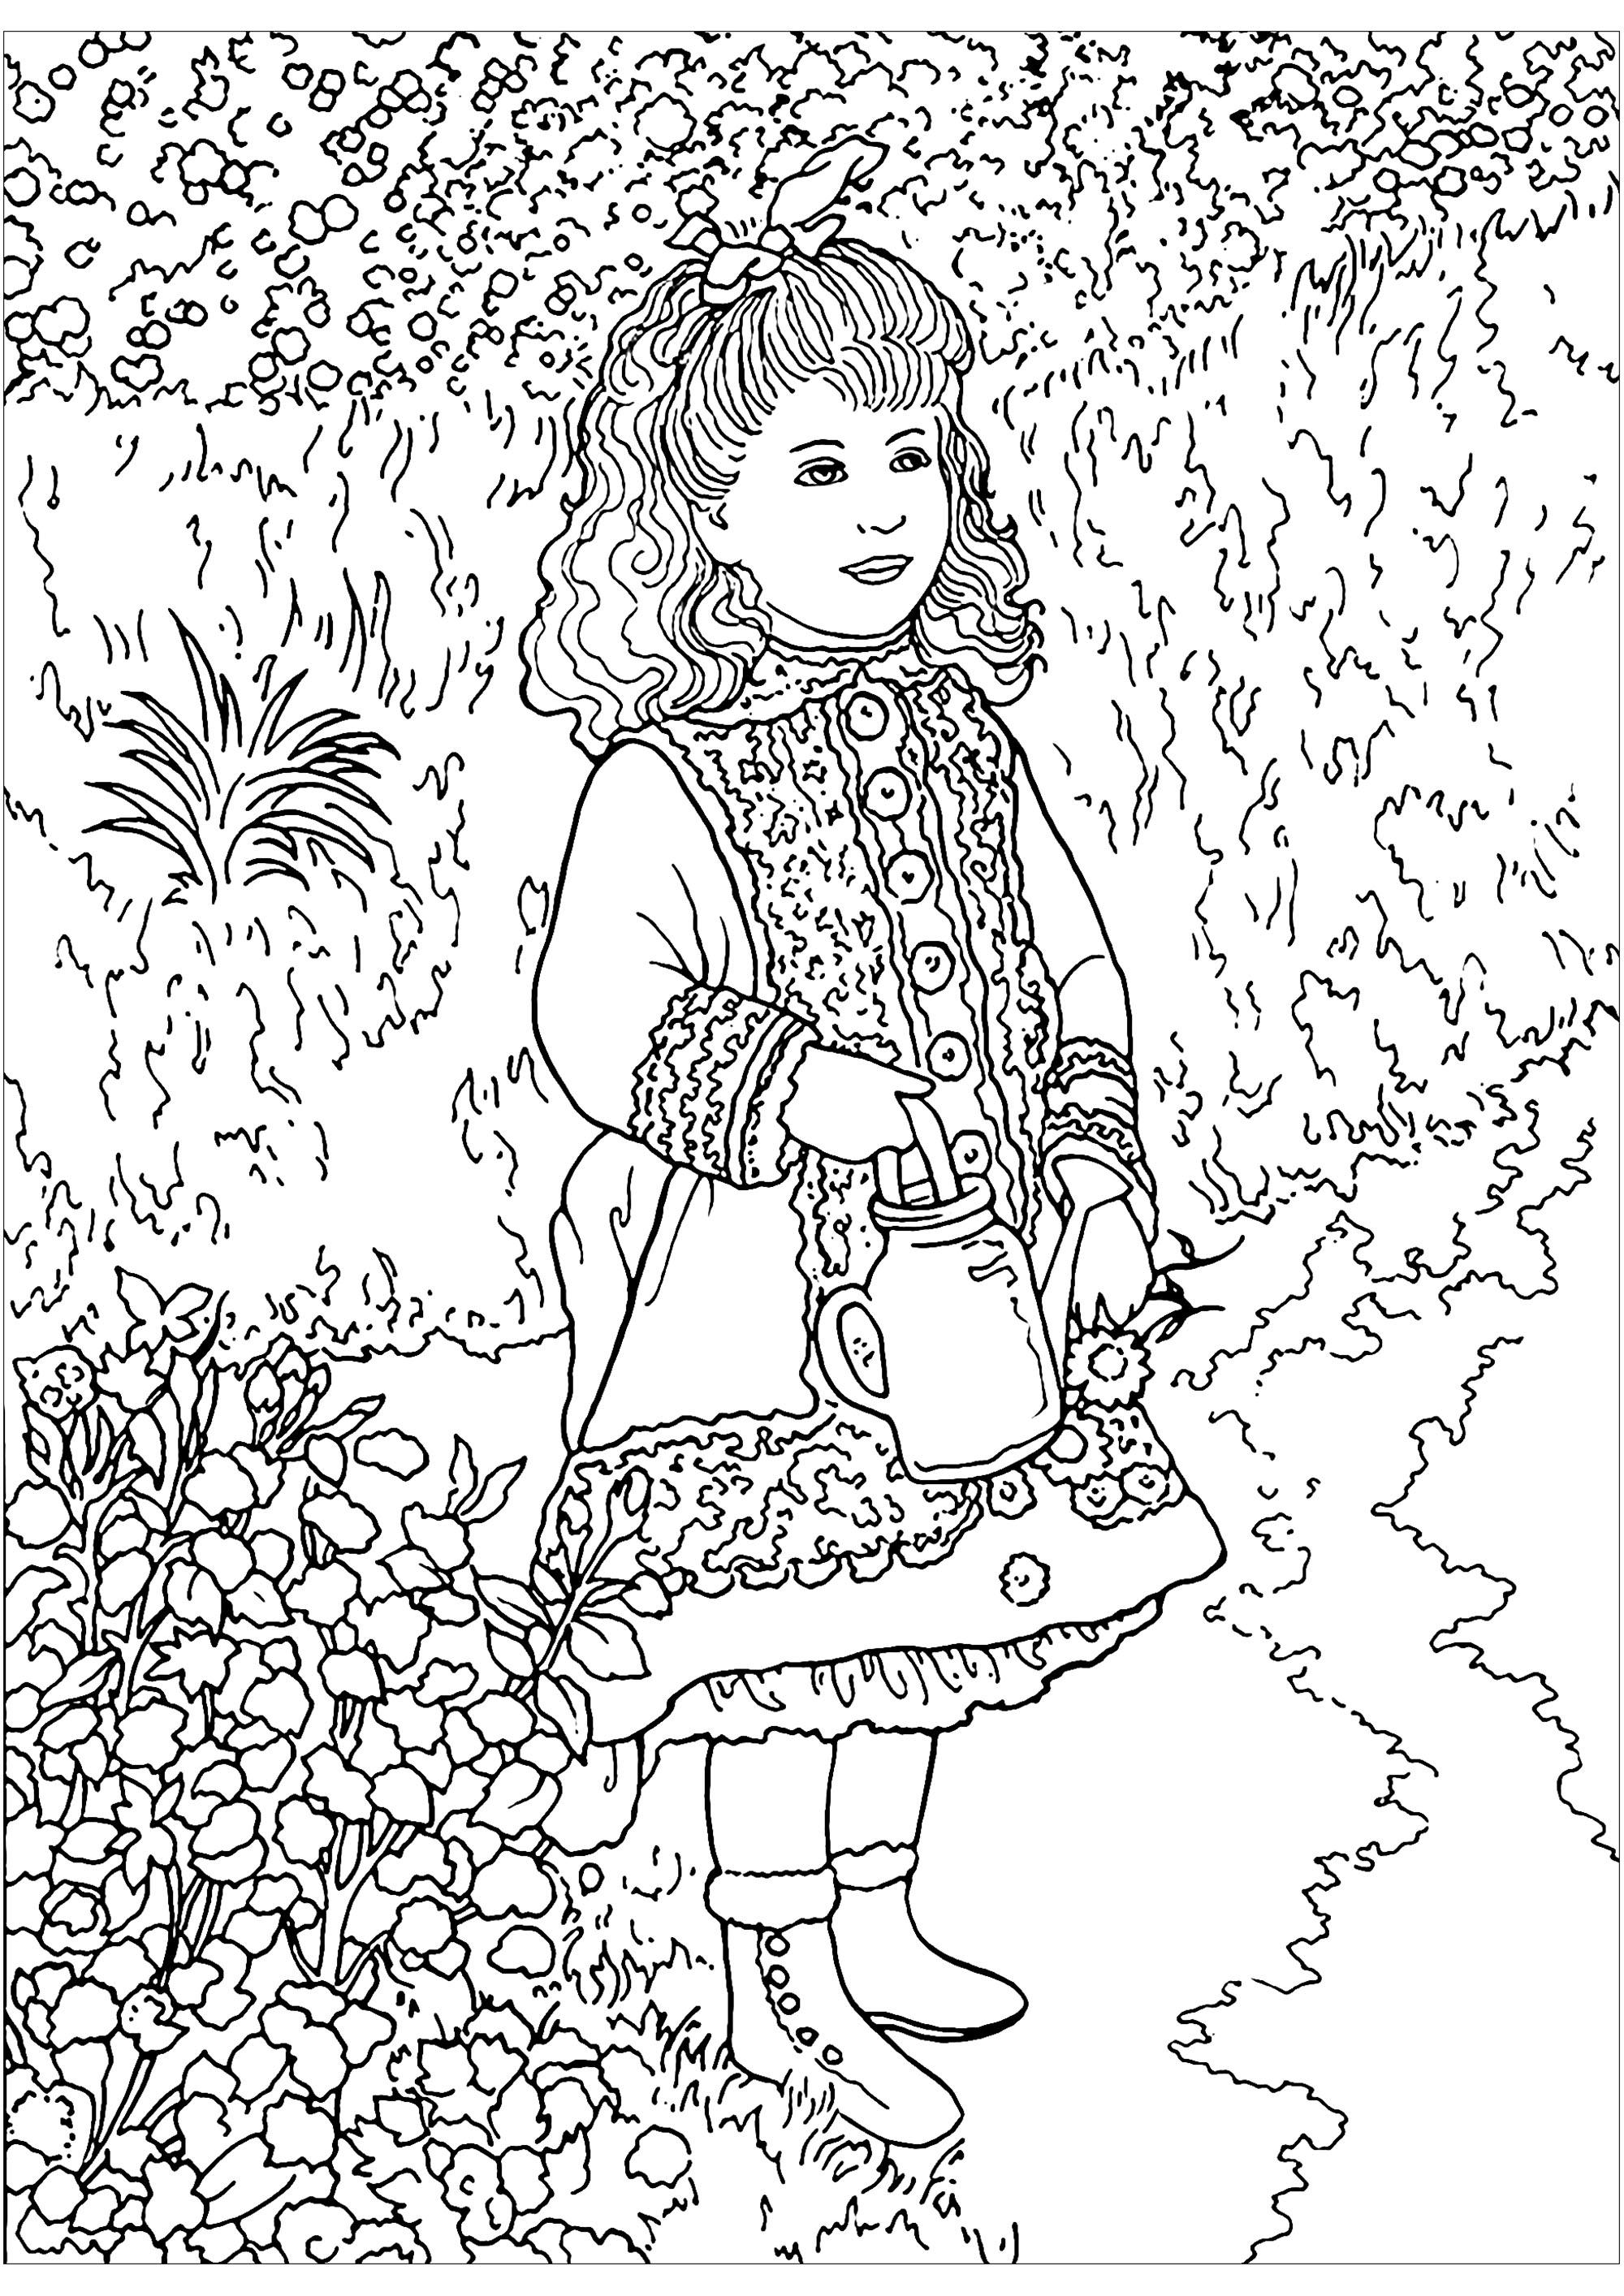 Colorear para Adultos : Obra de arte - 6